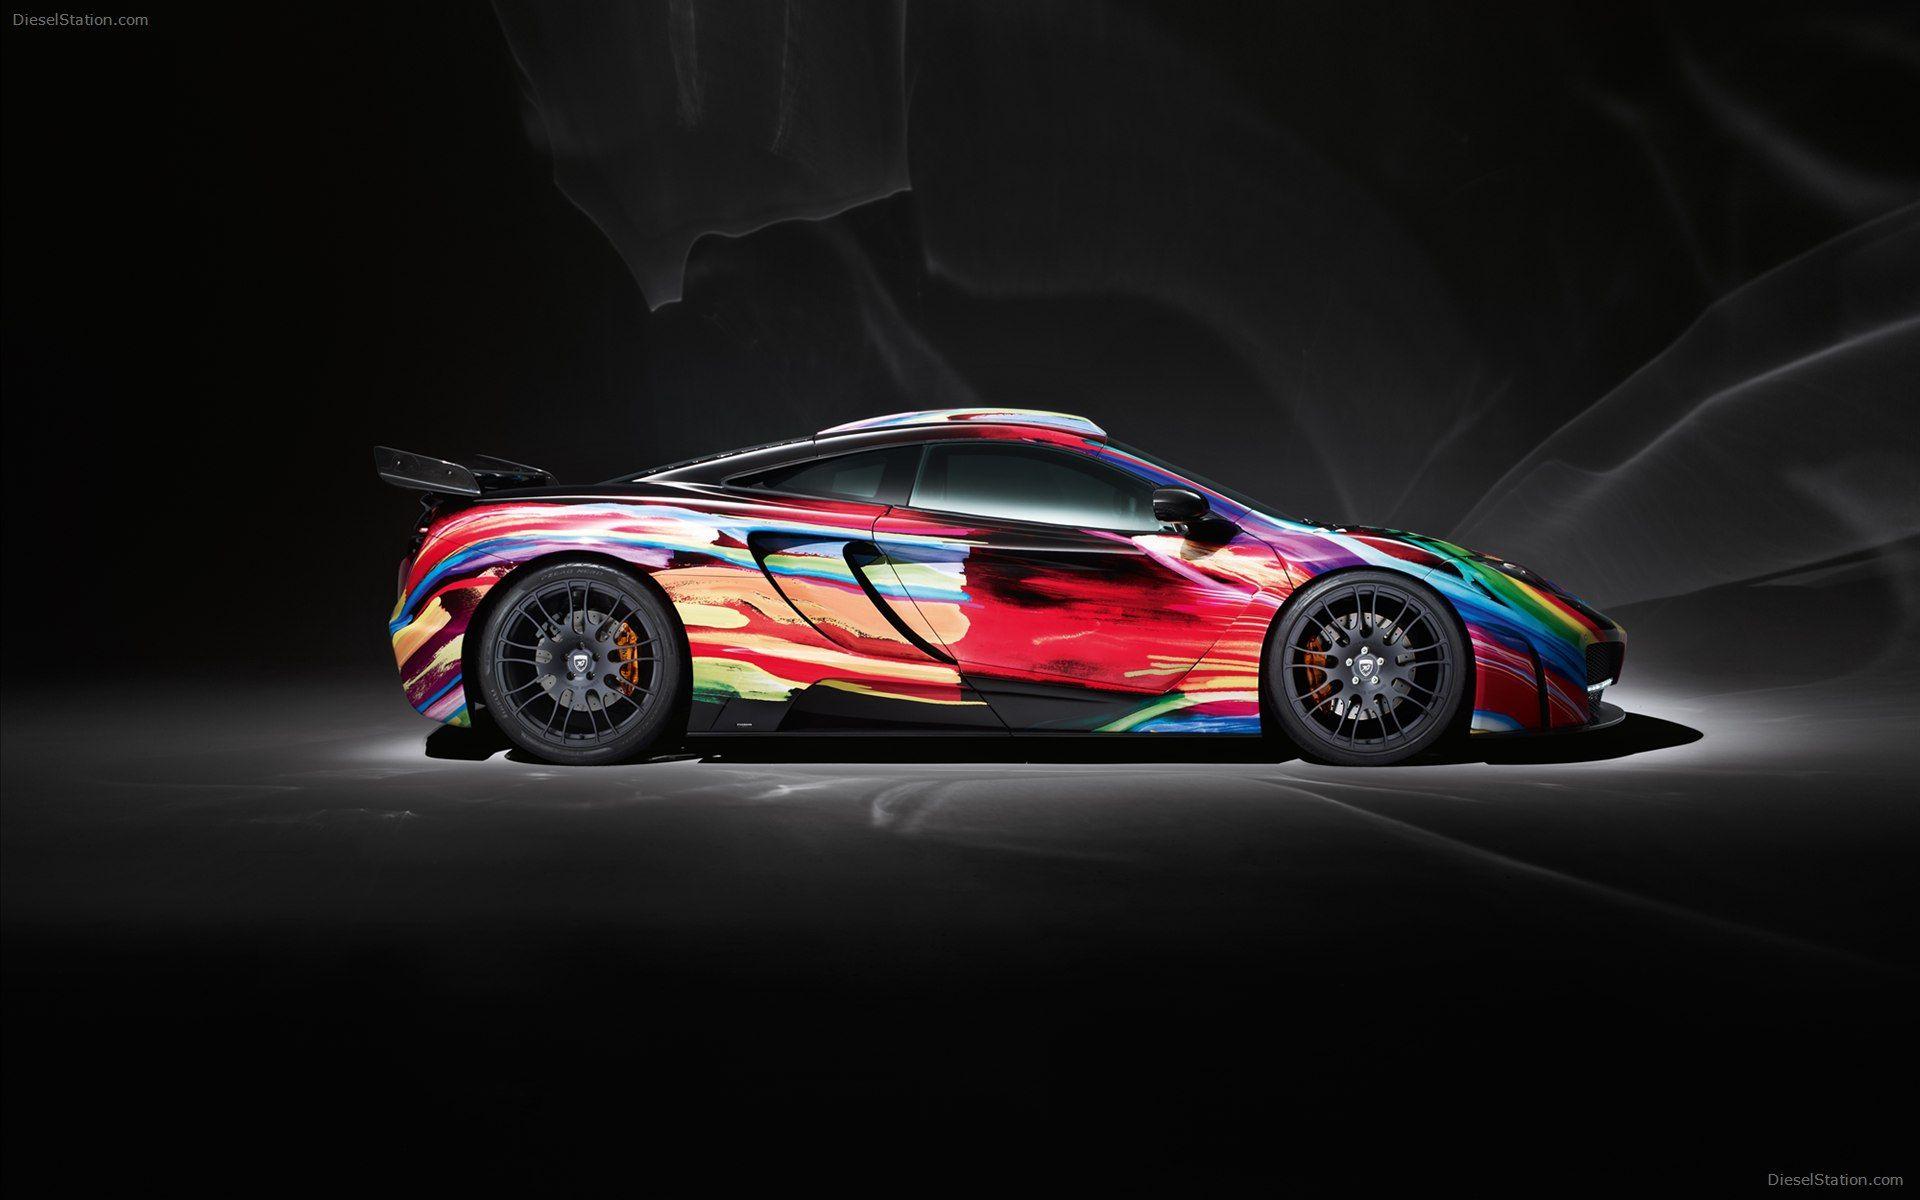 Latest Car Pictures At Dieselstation Art Cars Car Art Bmw Art